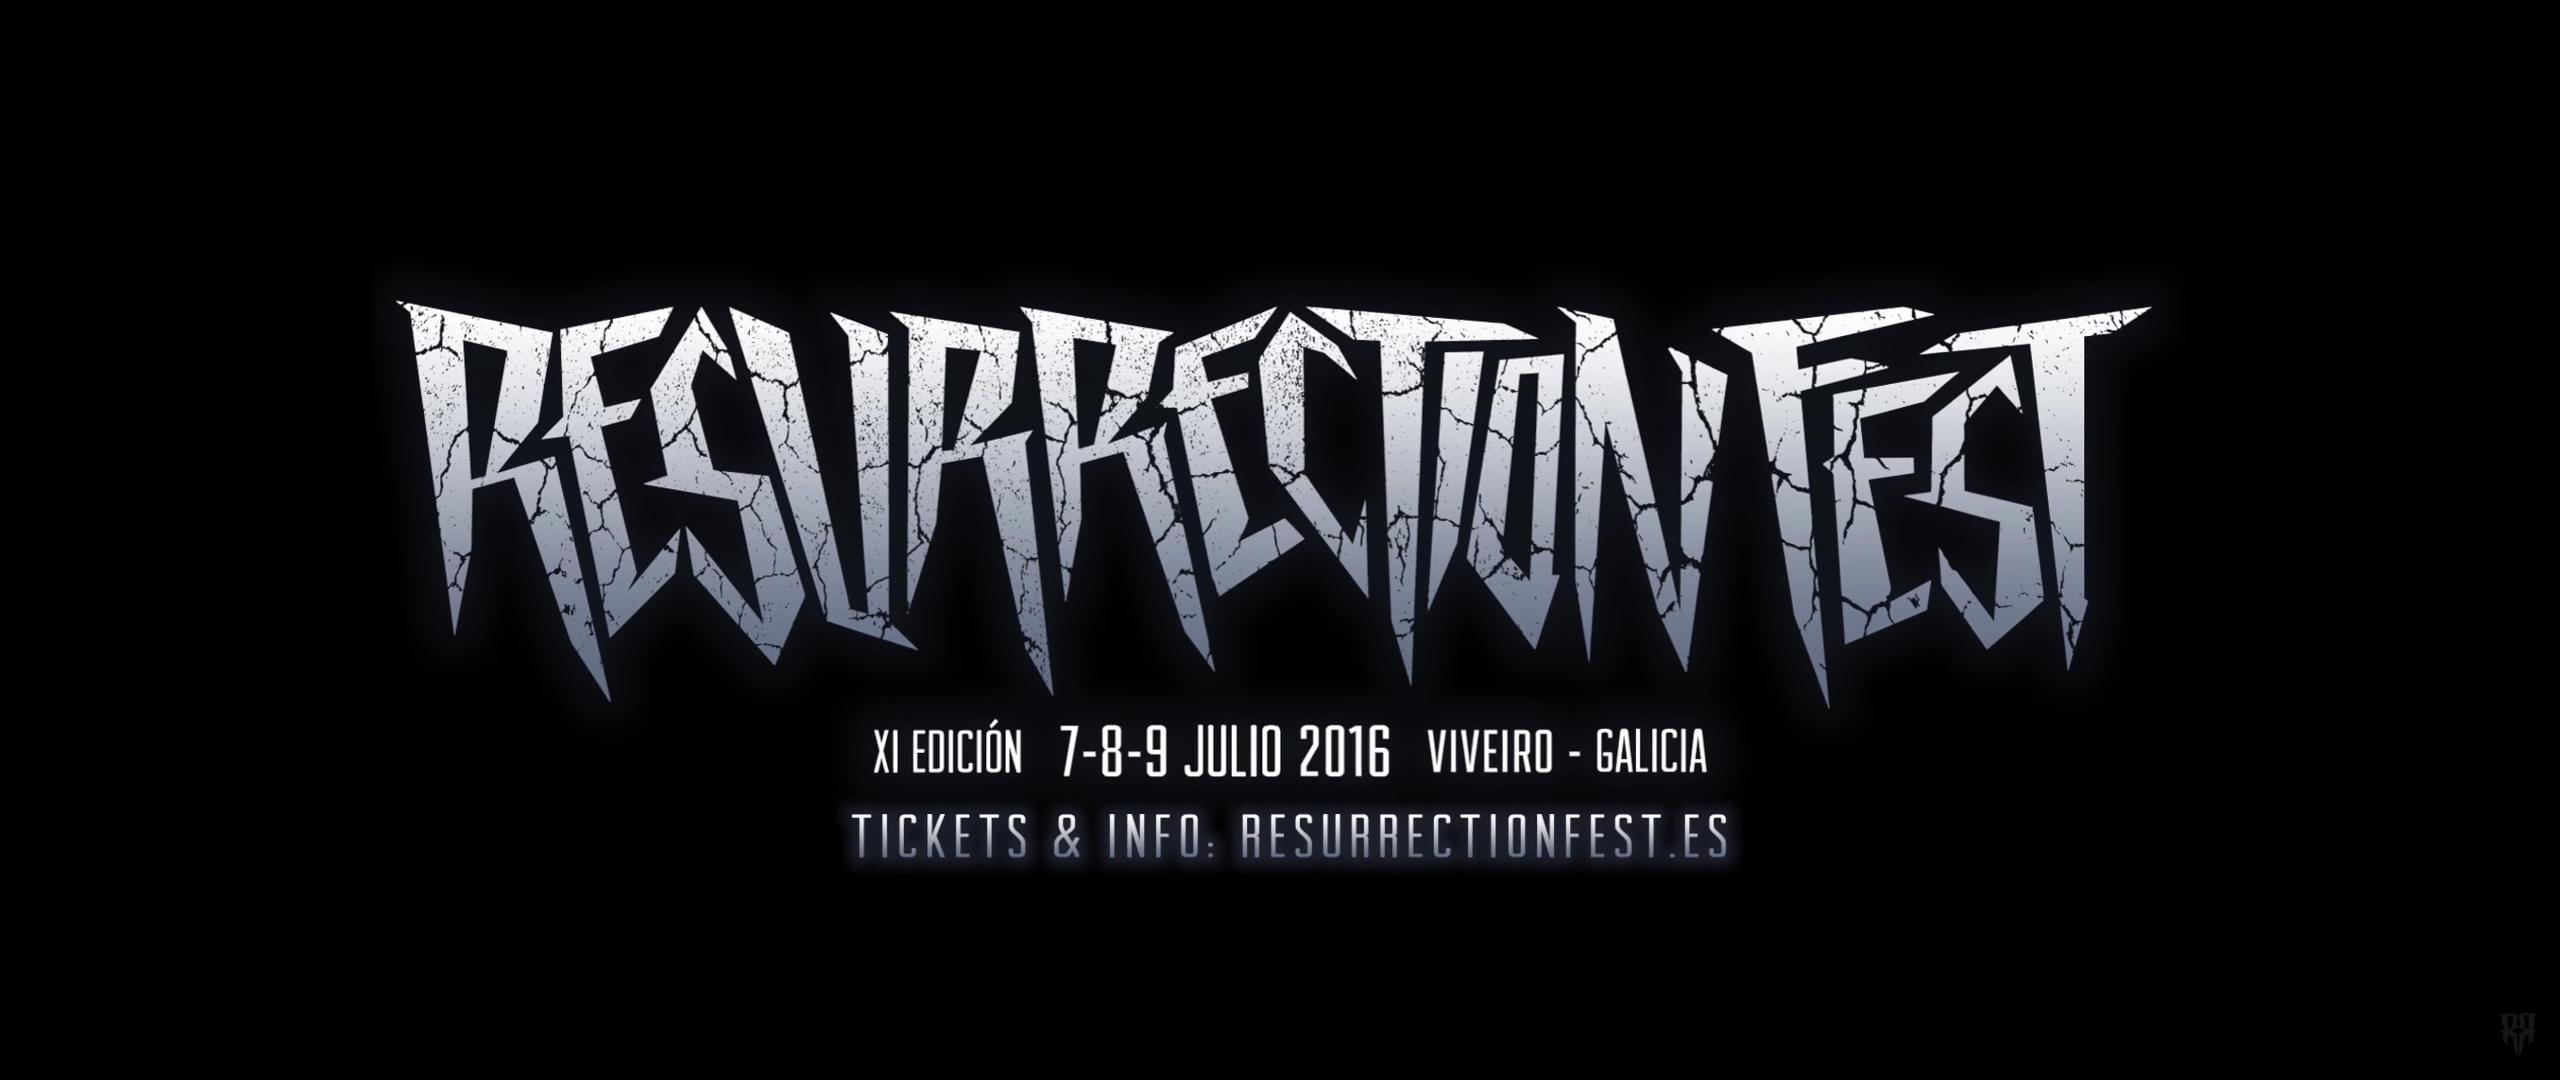 Resurrection Fest 2016 – Official video promo